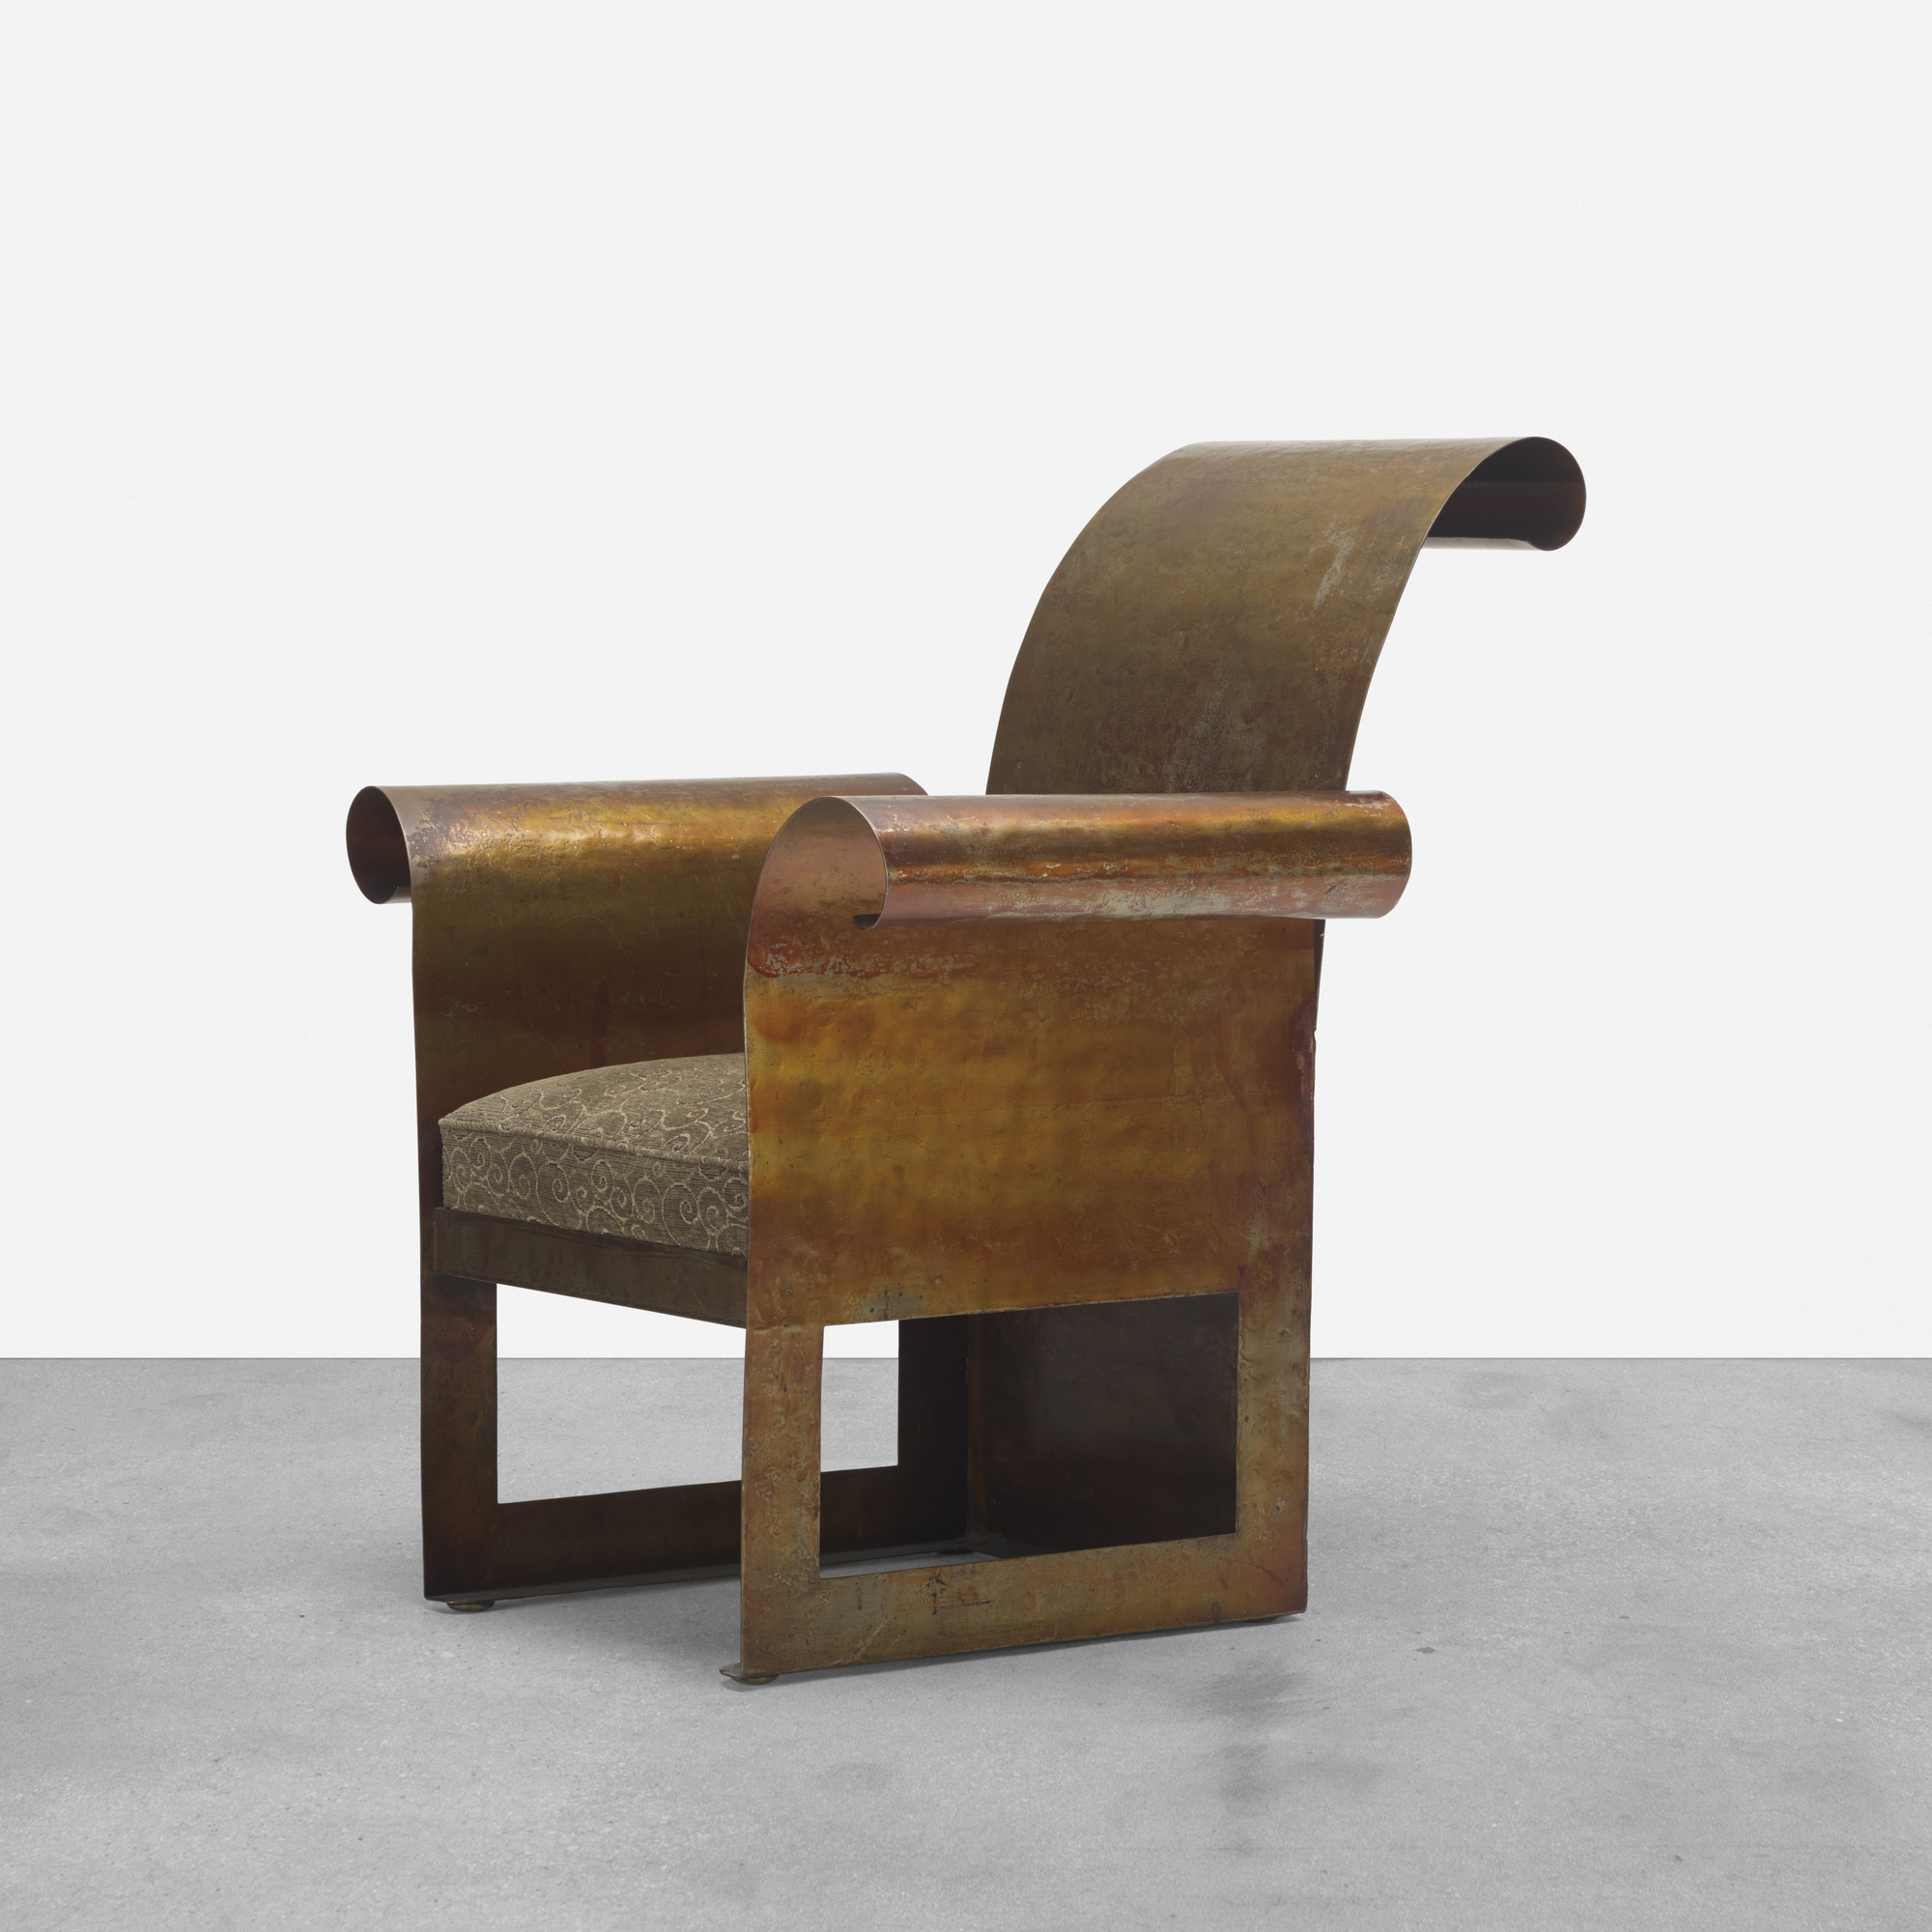 275: Jules Bouy / custom armchair for Carlos Salzedo (1 of 3)